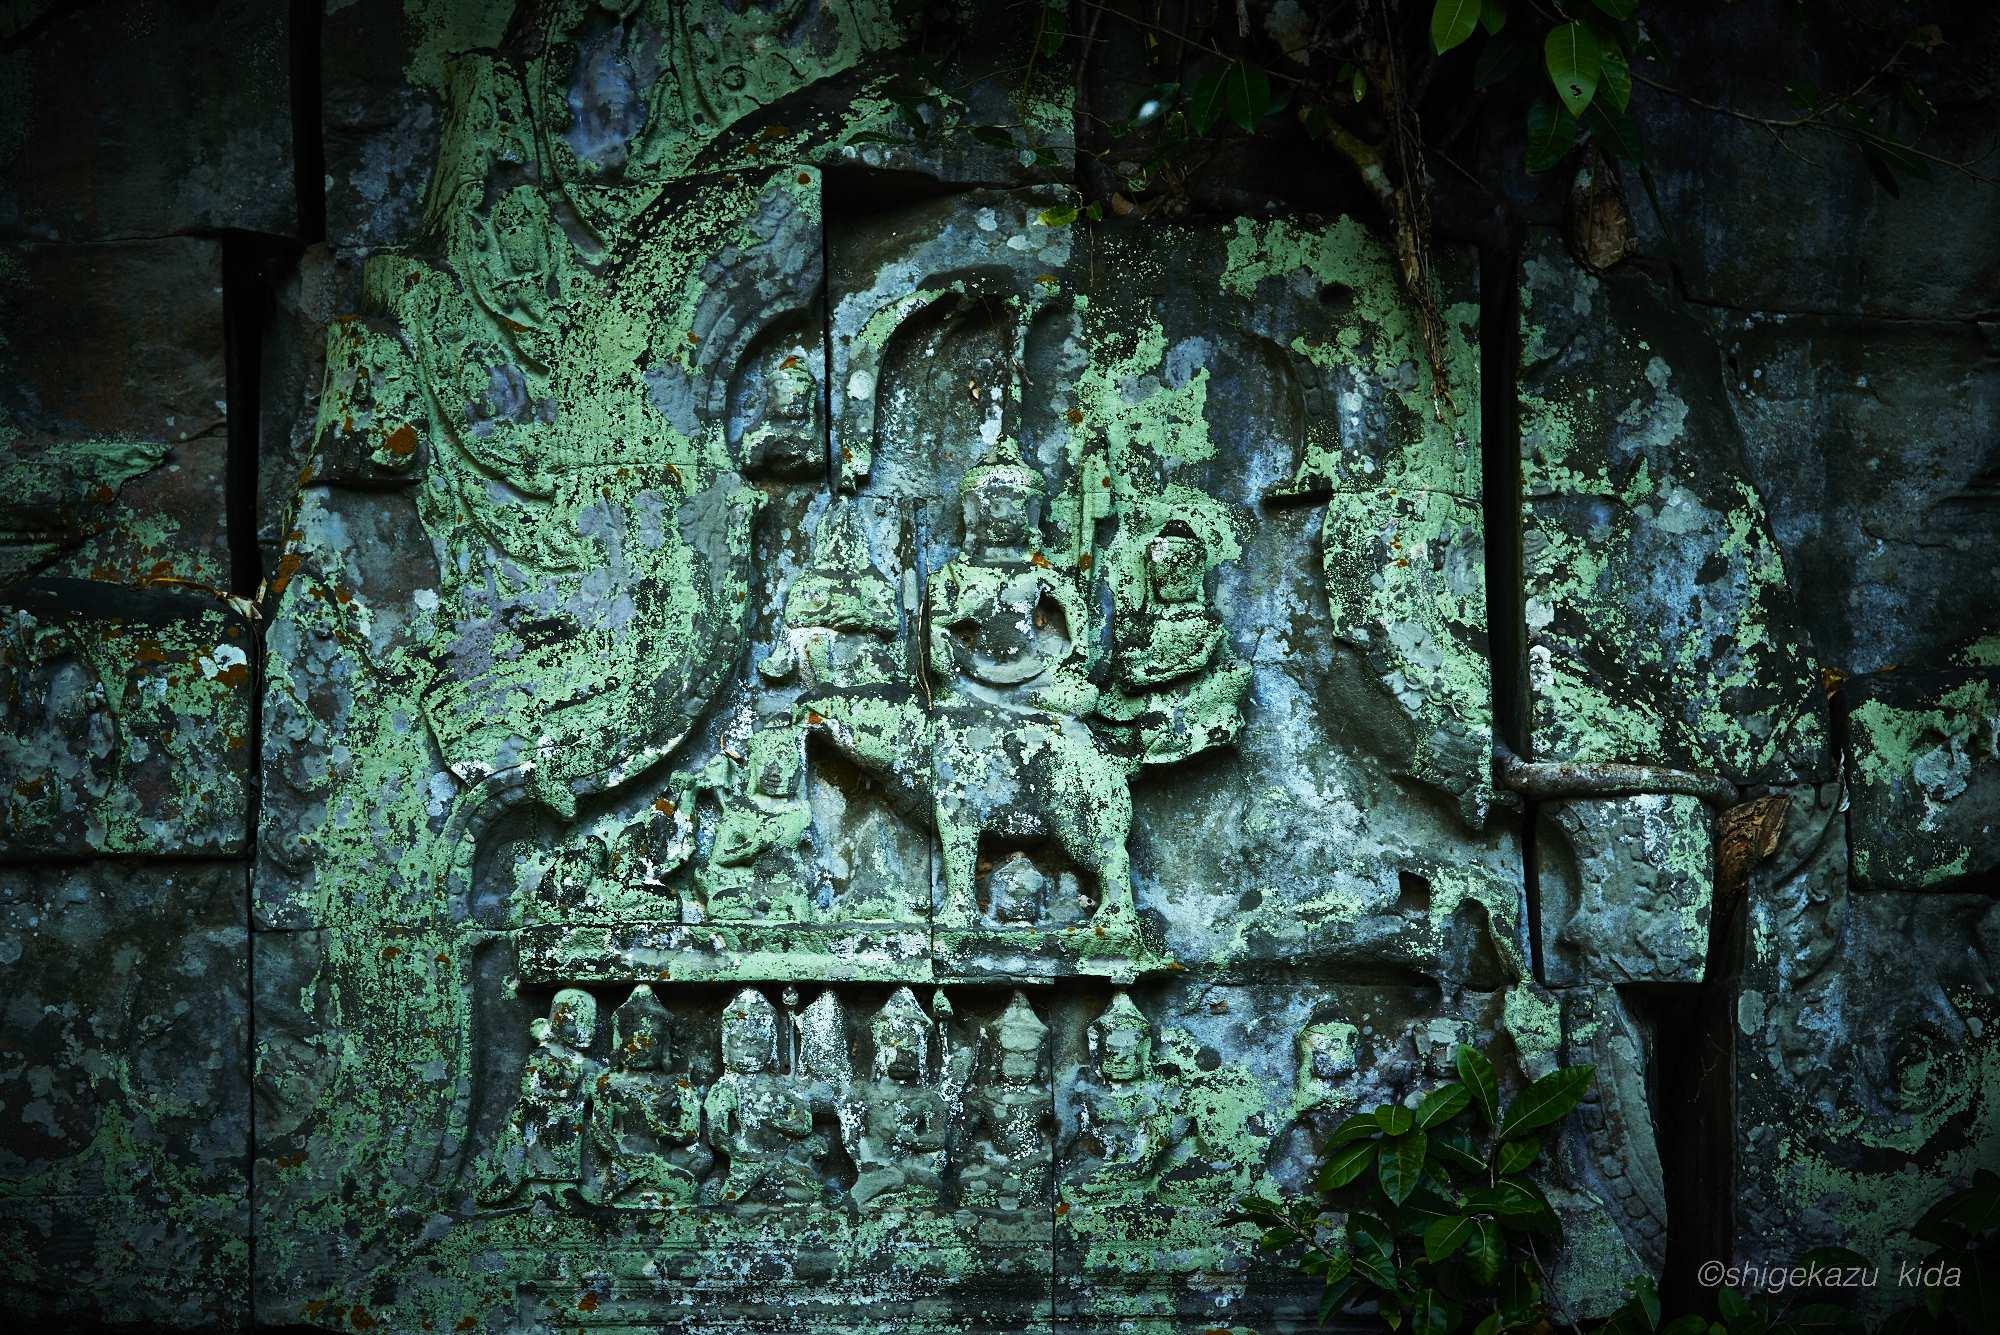 Angkor(アンコール)遺跡群にあるBengMealea(ベン・メリア)のインドラ神のレリーフ